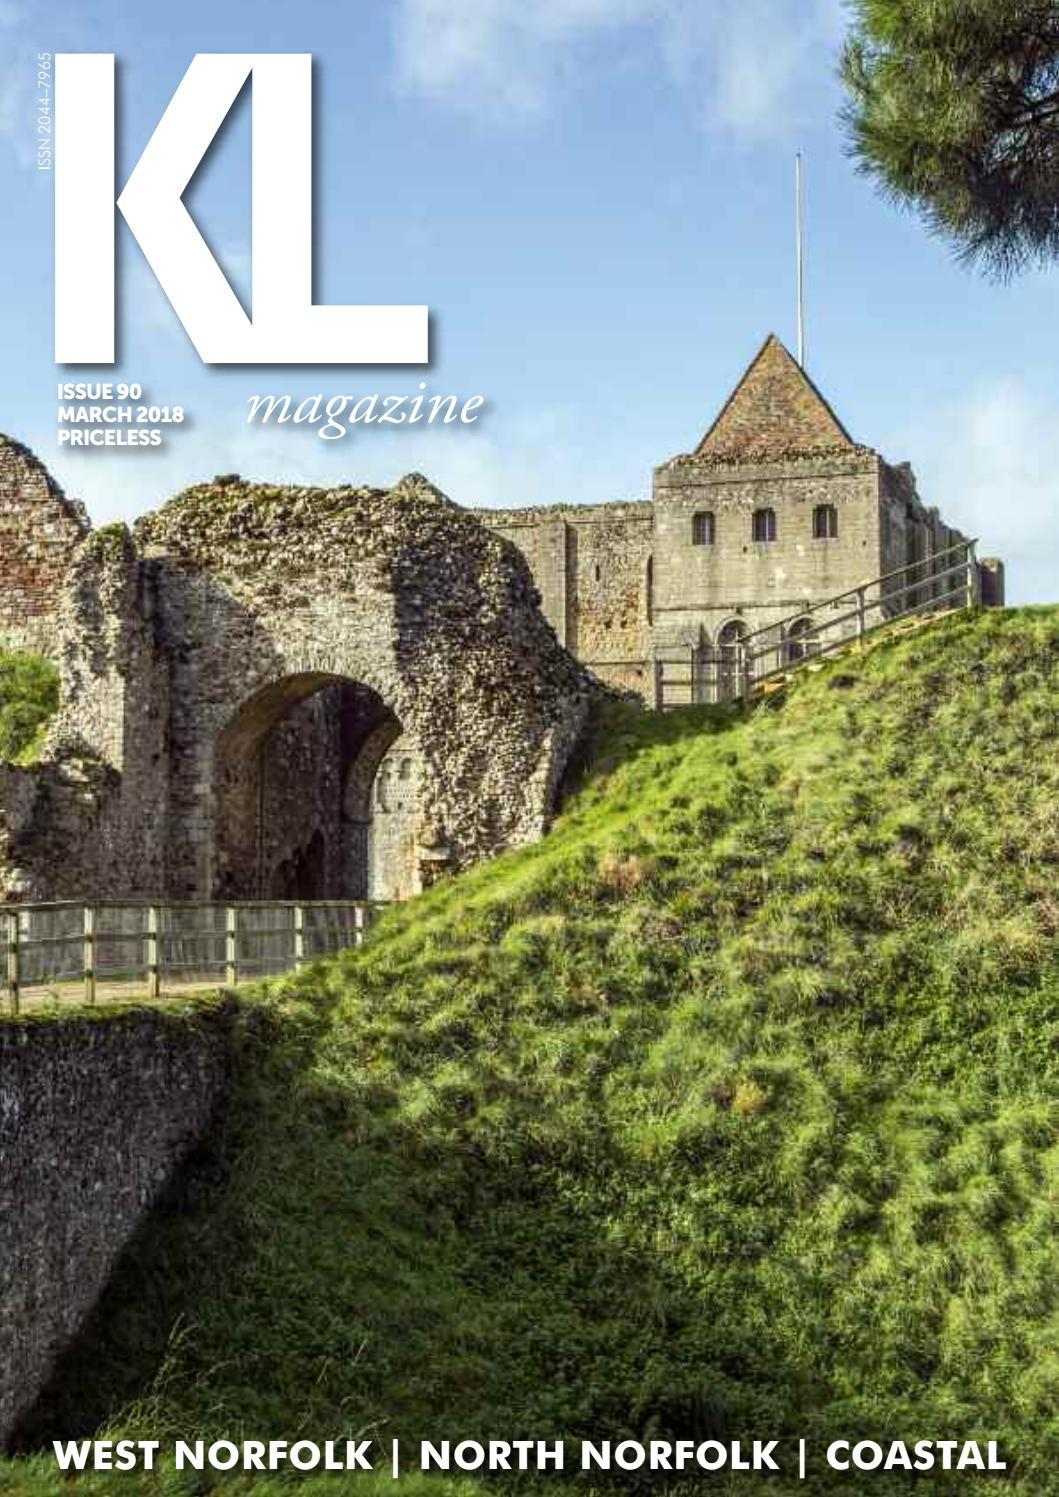 KL Magazine March 2018 by KL magazine - issuu